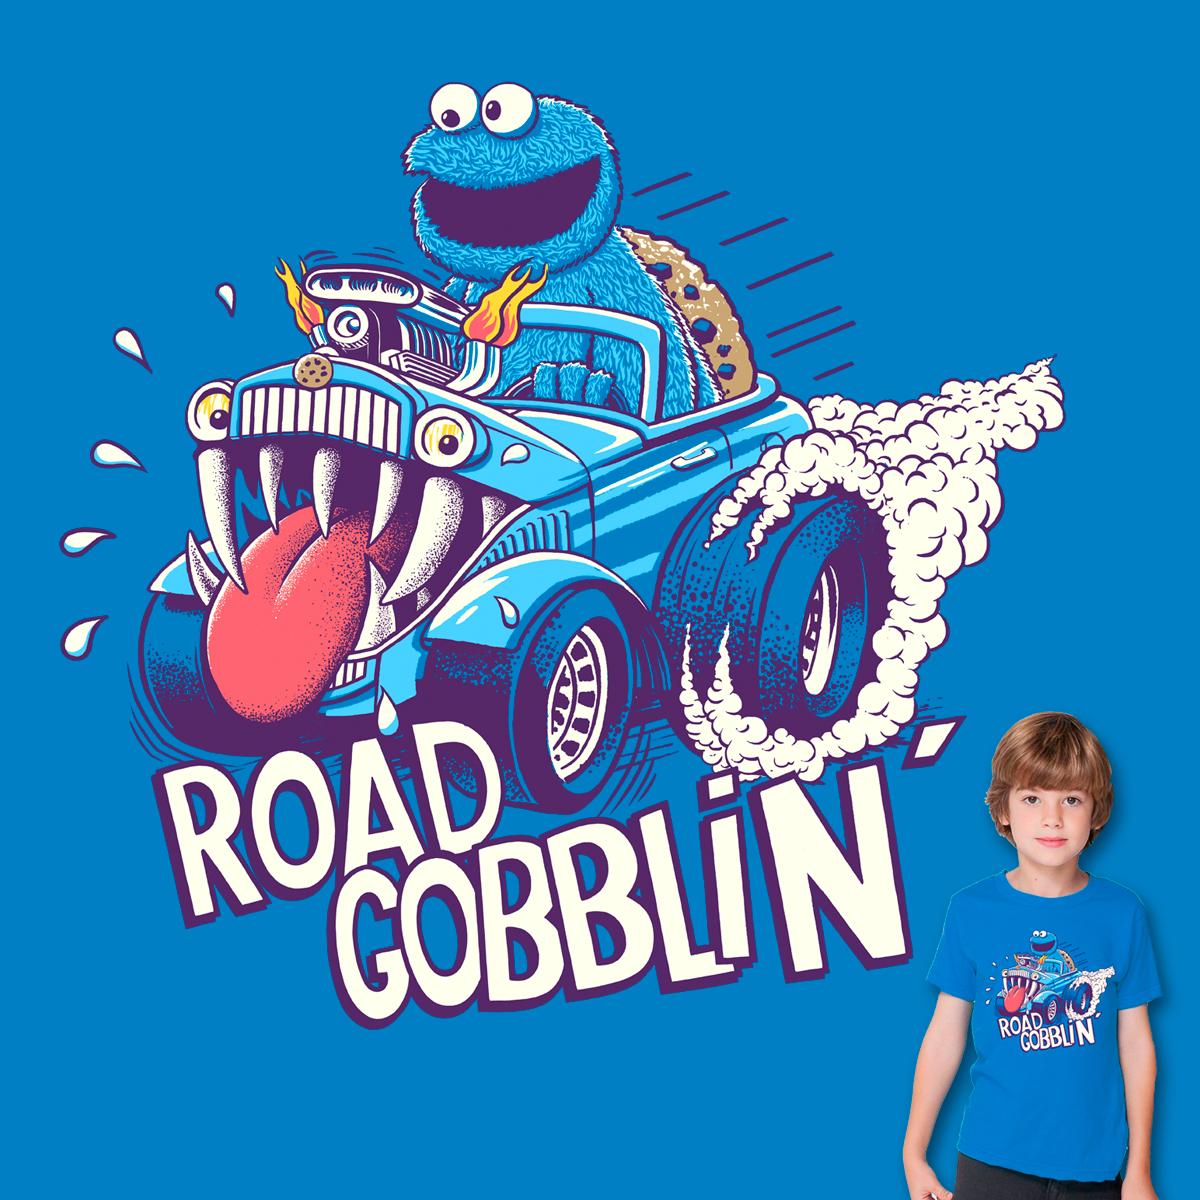 Road Gobblin' by v_calahan on Threadless